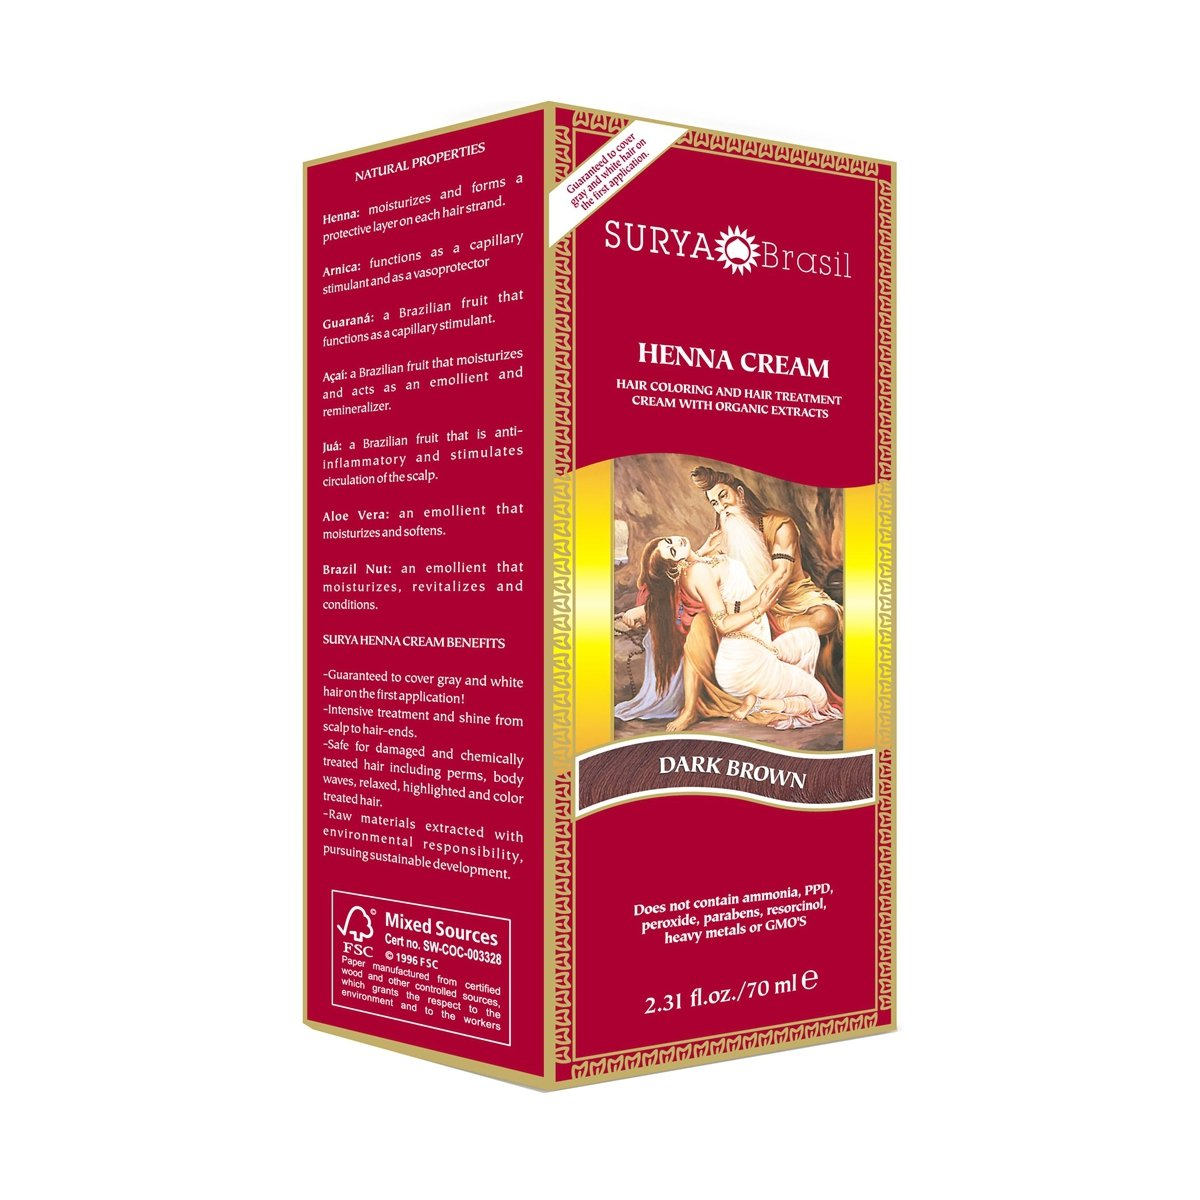 Surya Brasil: Natural Henna Cream, Dark Brown 2.31 oz (6 pack)